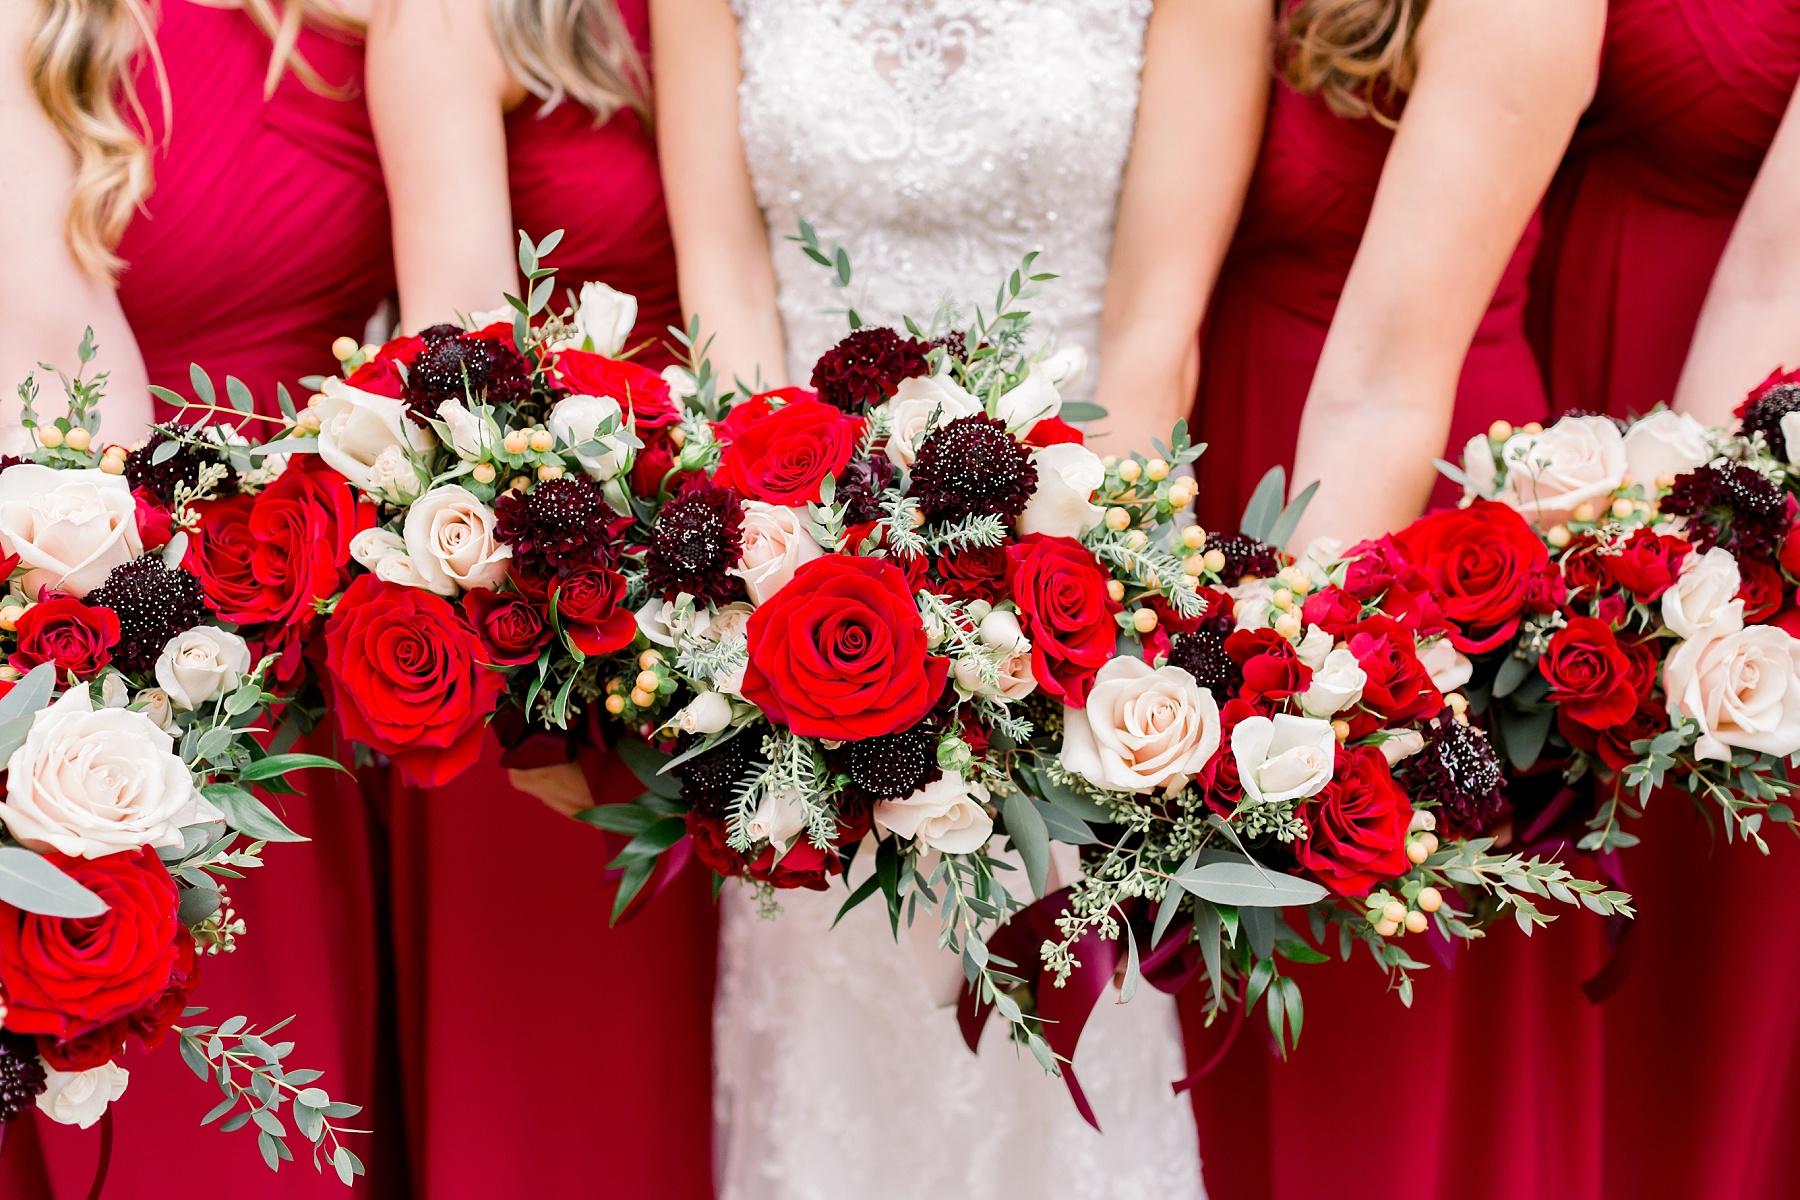 midwest-adventurous-wedding-photographer-elizabeth-ladean-photography-photo_4821.jpg